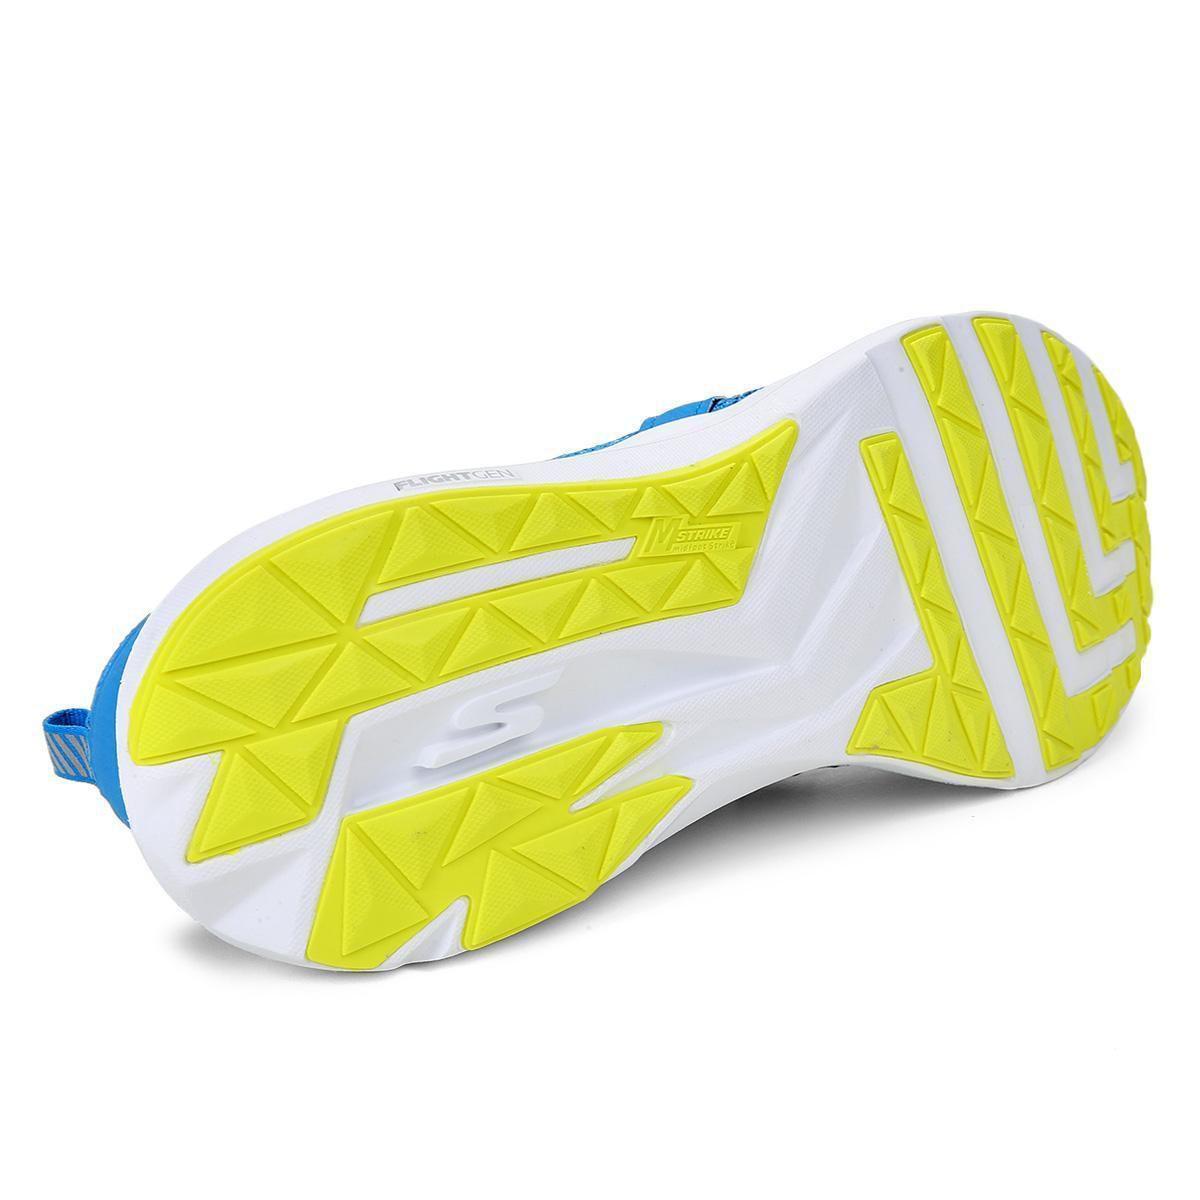 2e0307473 Tênis Skechers Go Run Ride 7 Masculino - Azul - ORIGINAL - Titanes Esportes